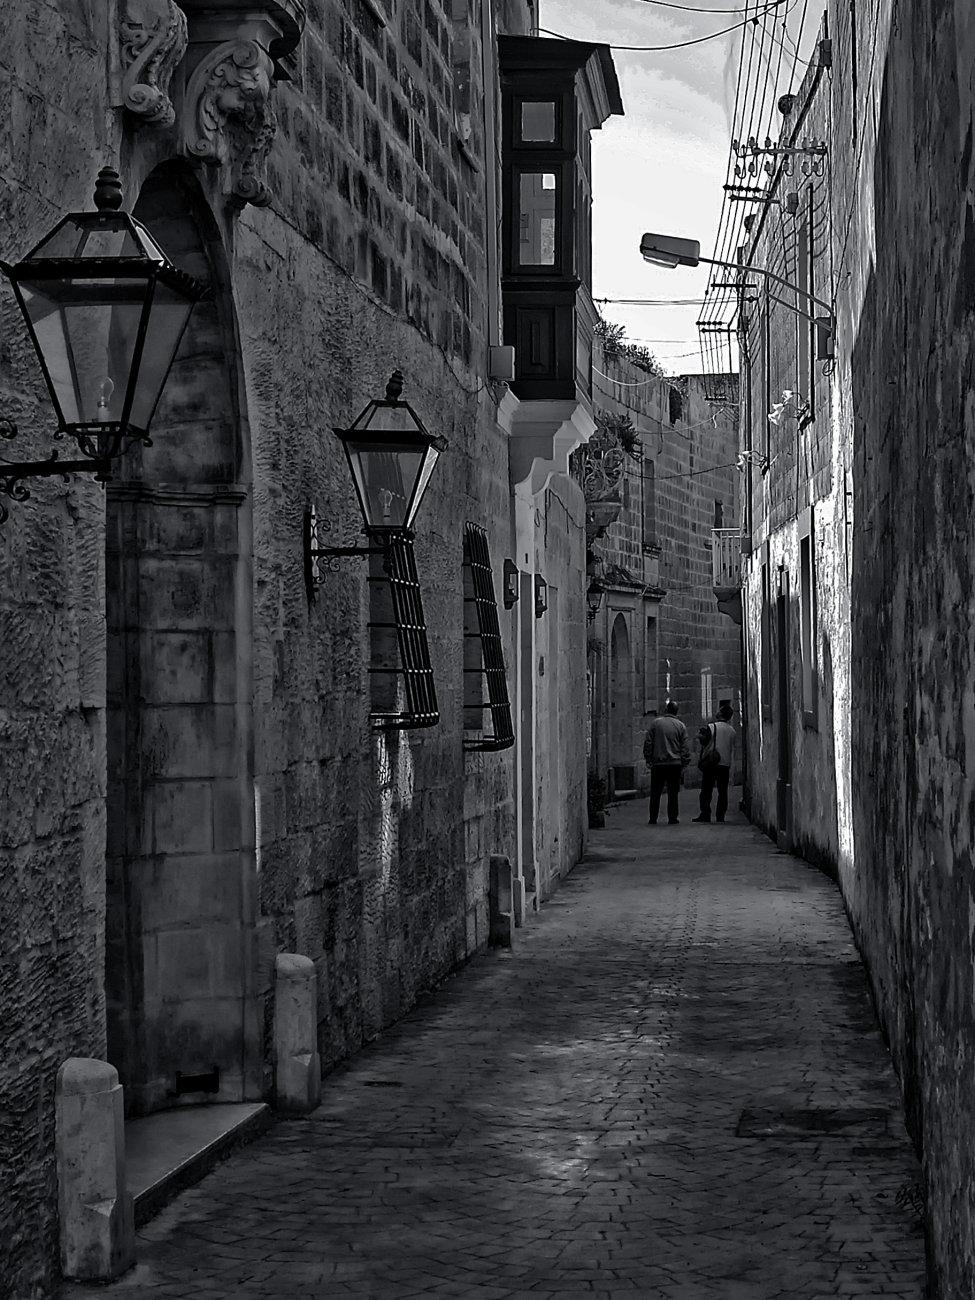 An Alley in Zebbug